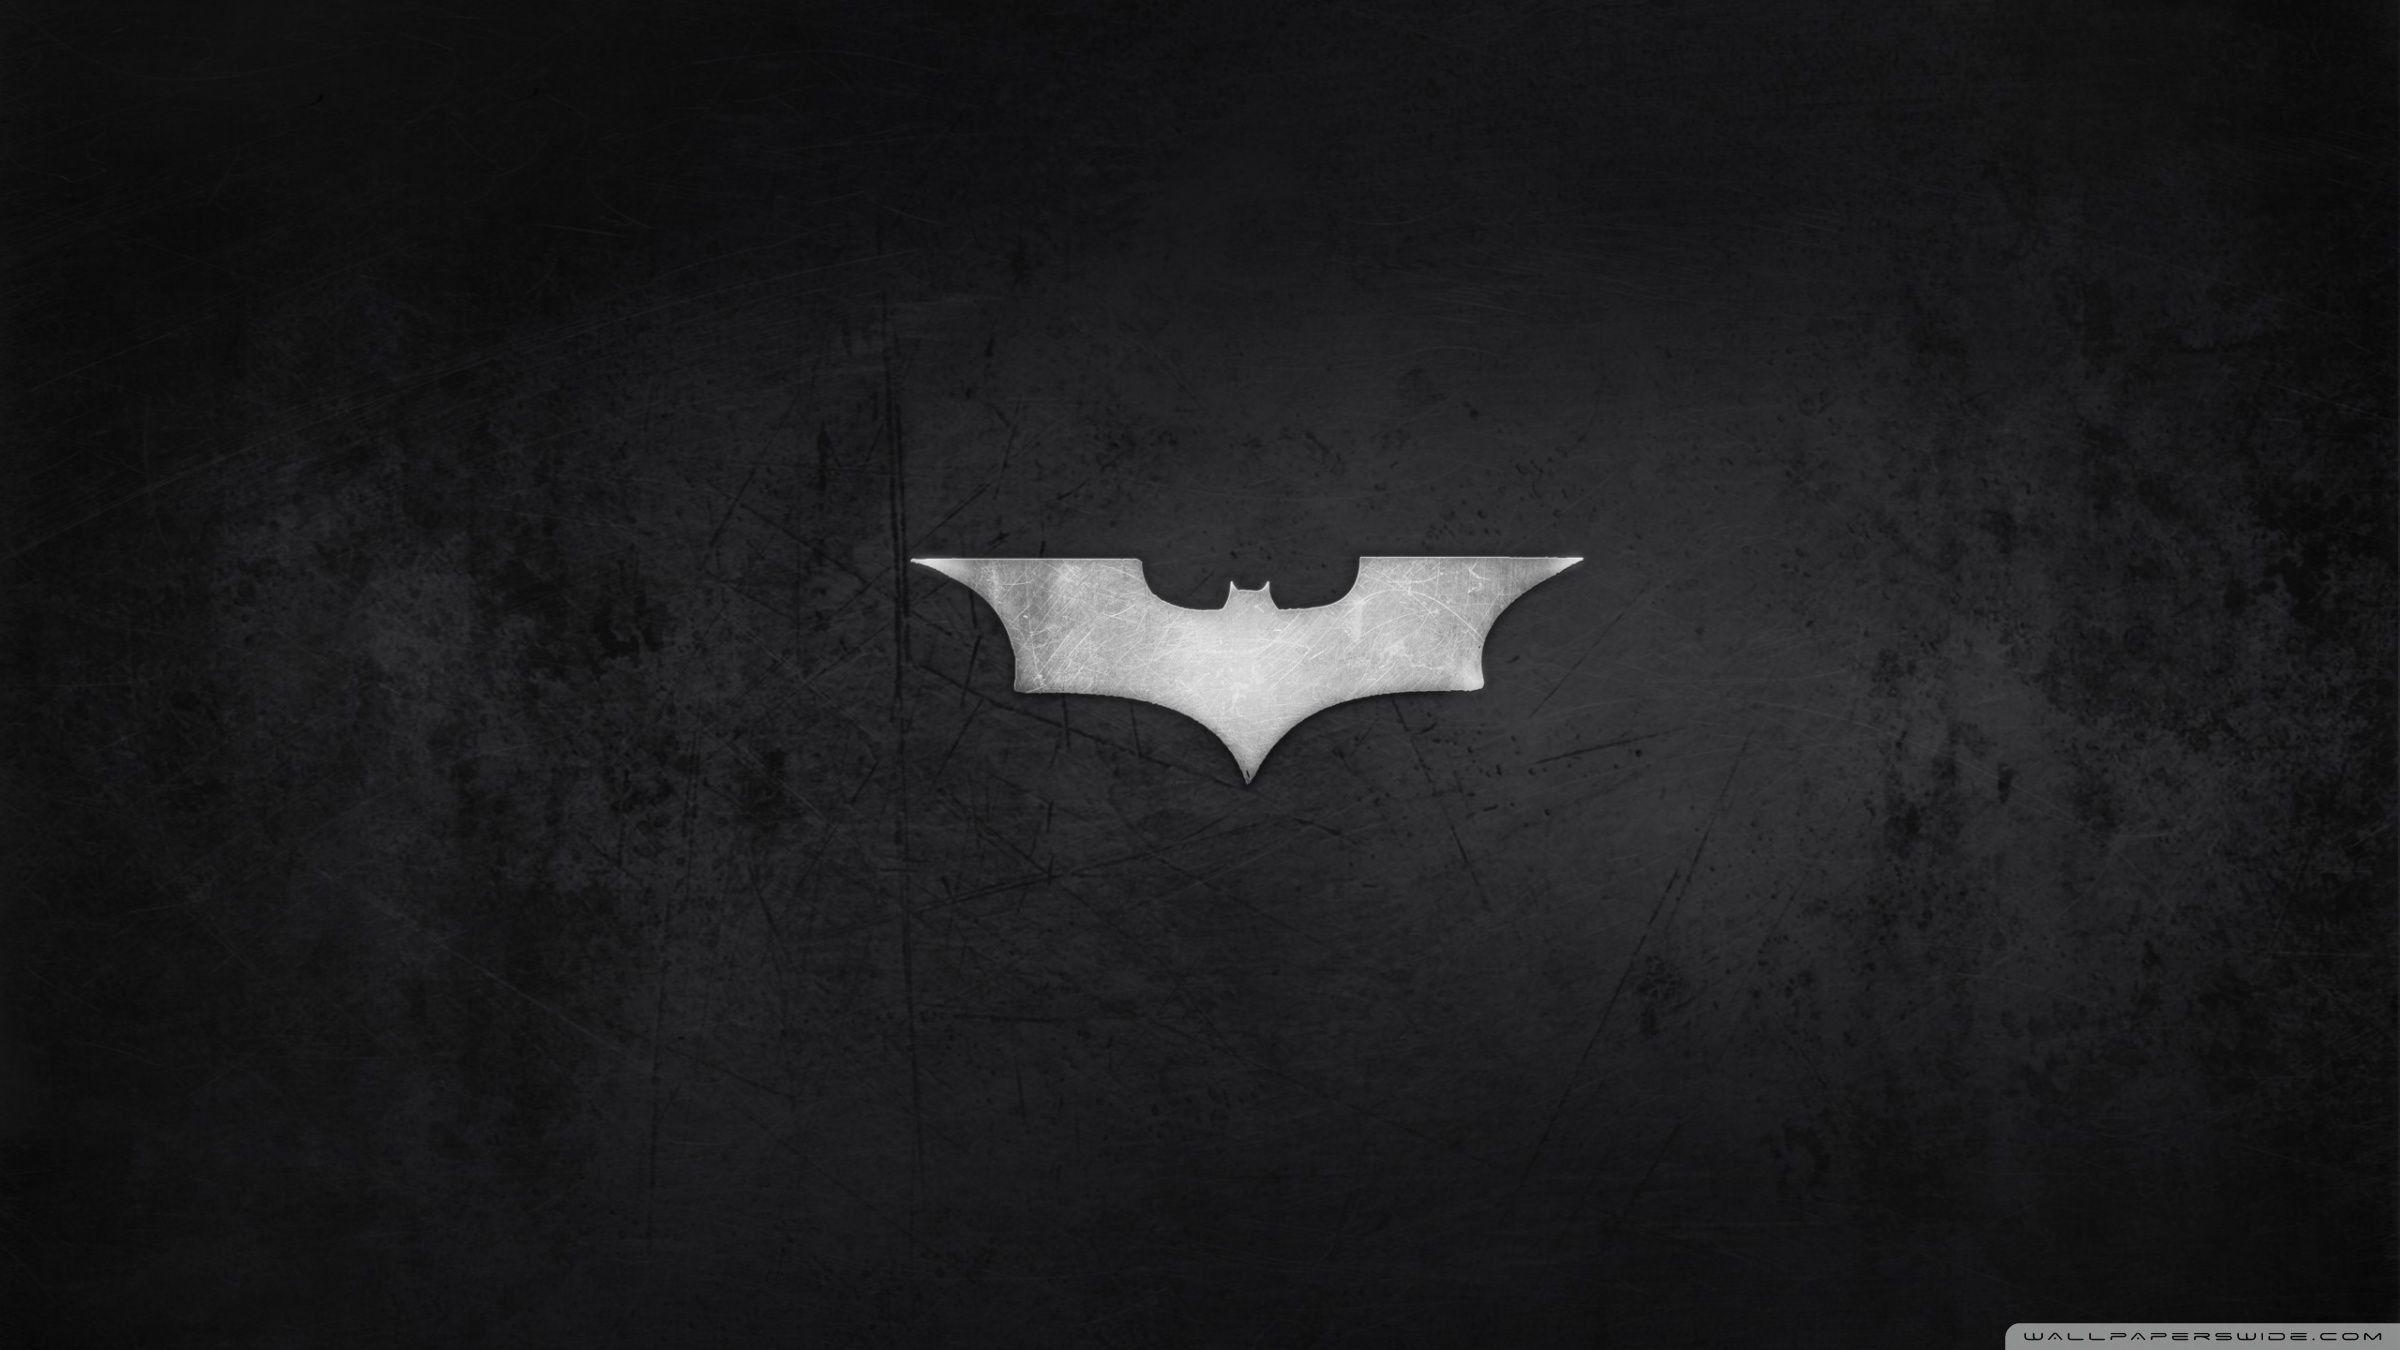 Lovely Batman Logo Wallpaper Batman Wallpaper Batman Logo Wallpapers Batman Wallpapers